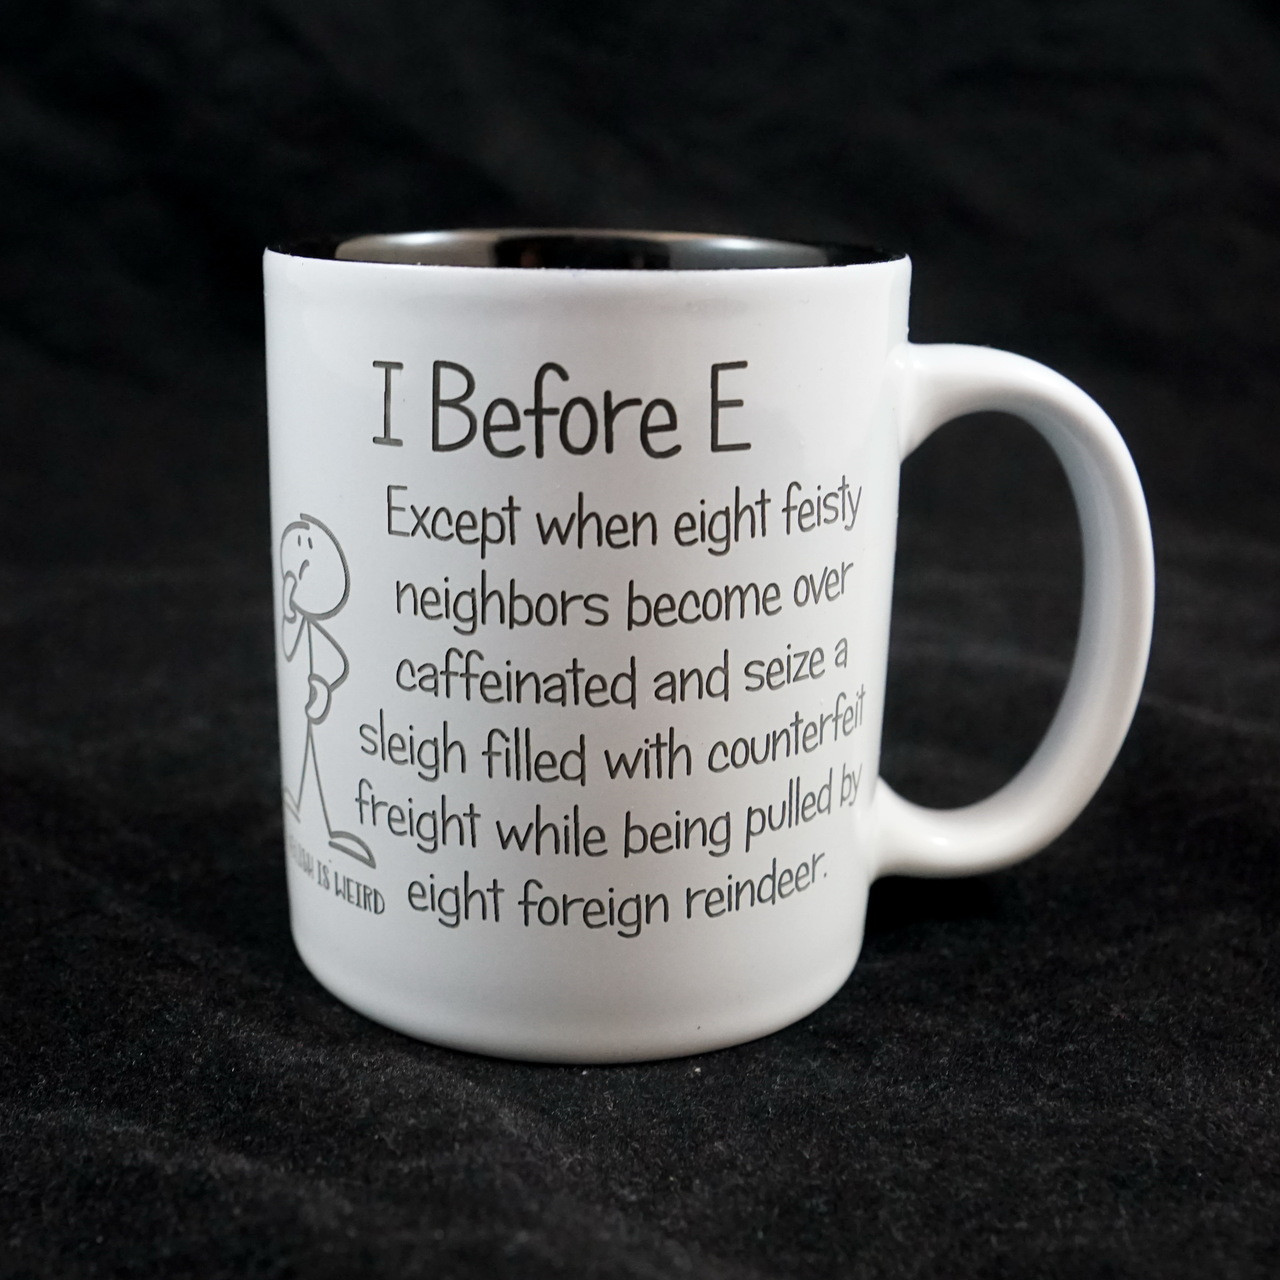 I Before Mug Is Weirdcoffee Eenglish sdxothCrQB